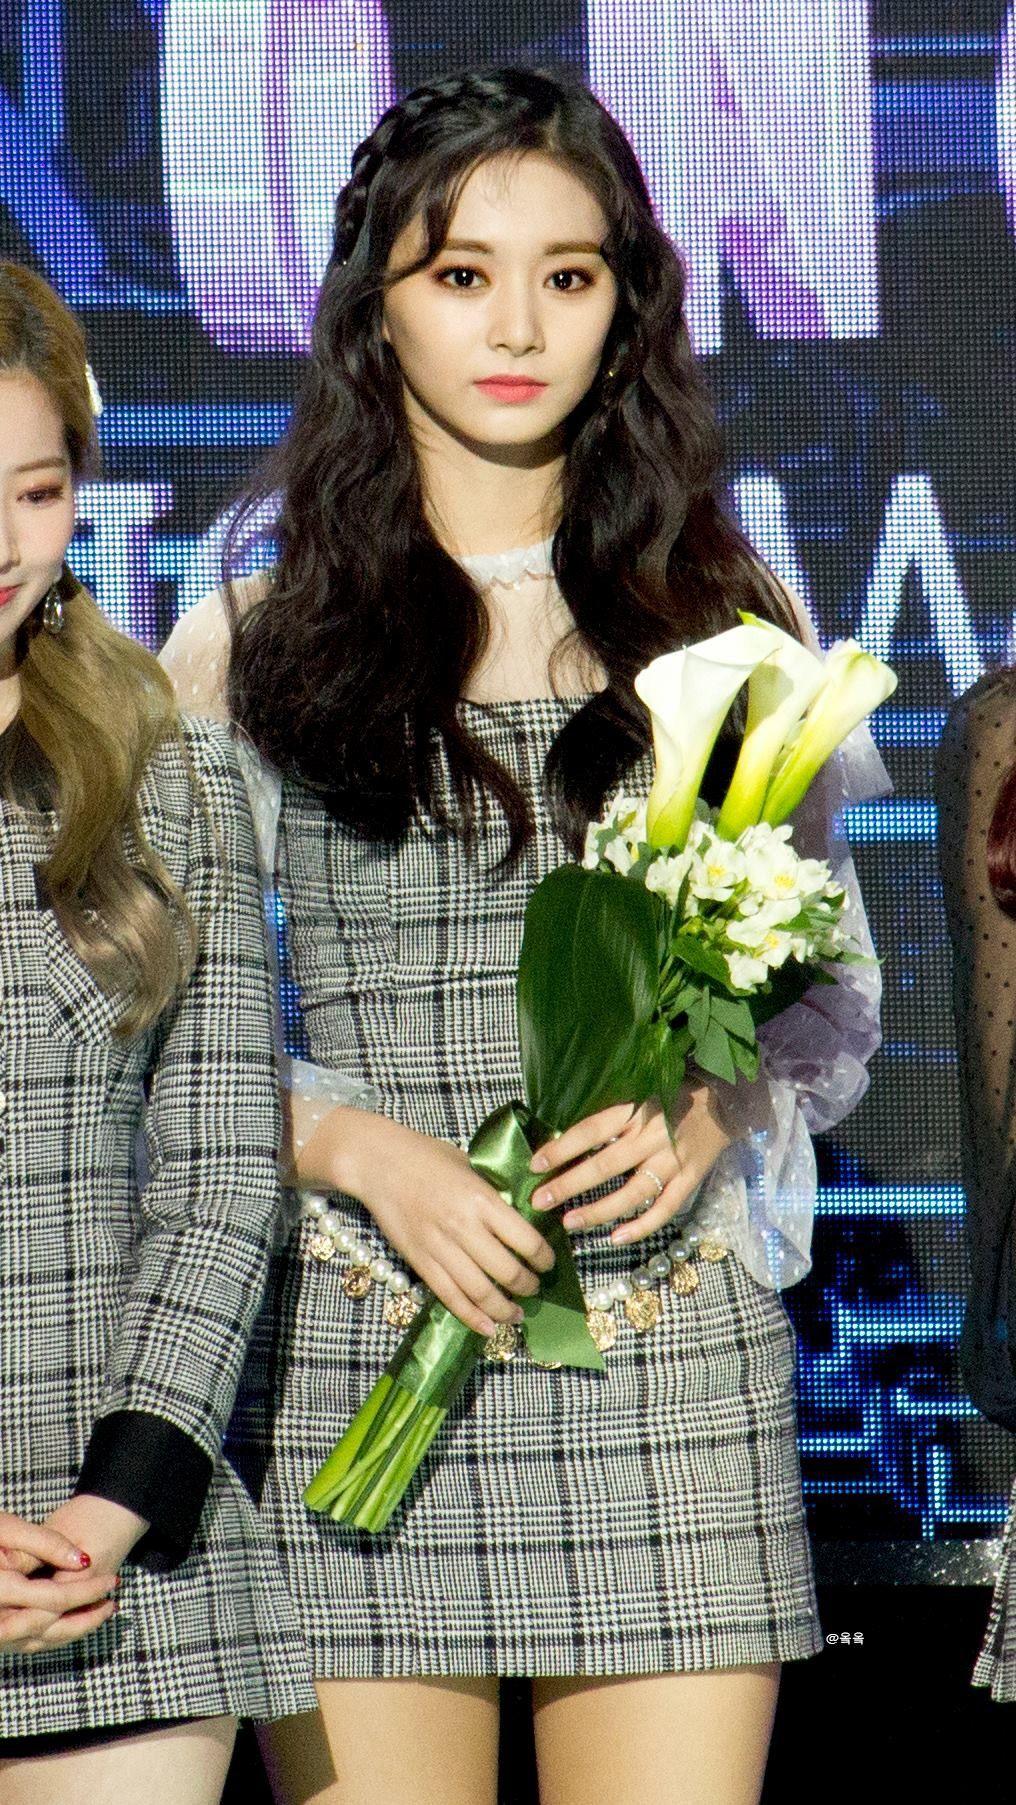 Pin by Vy on Twice | Nayeon, Kpop girls, Women